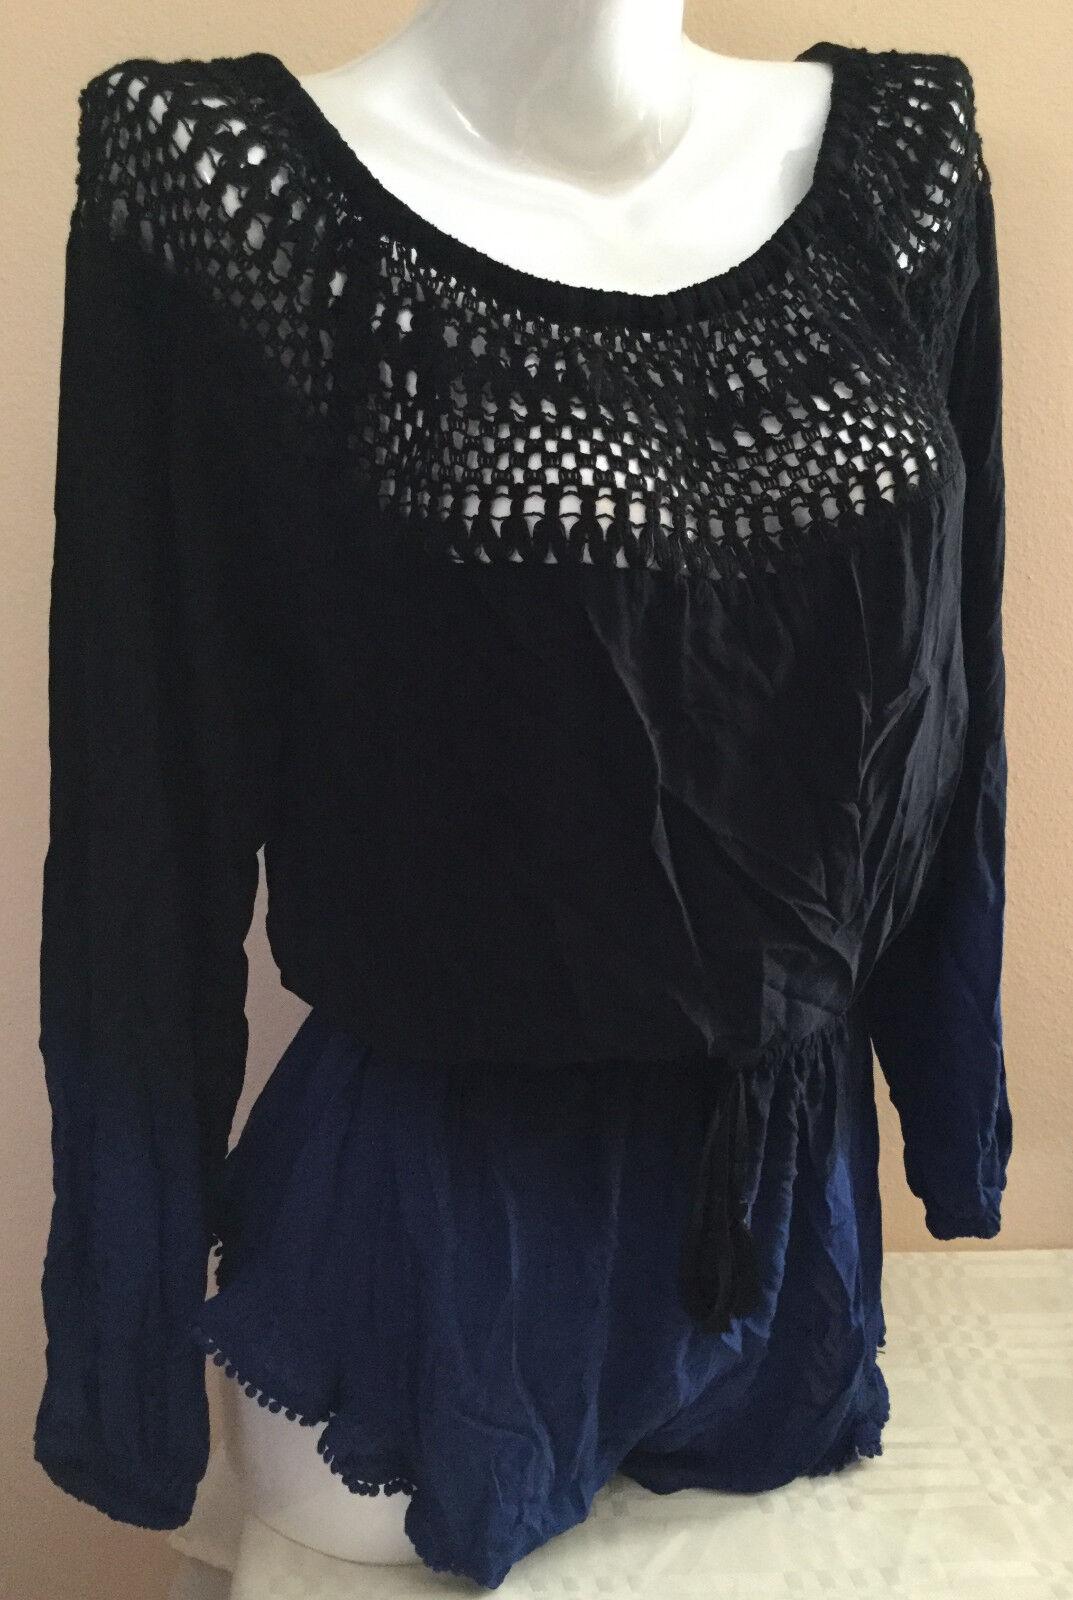 $89 NWT VICTORIAS SECRET Crochet Tassel Romper Swim Cover-Up OnePiece S N801